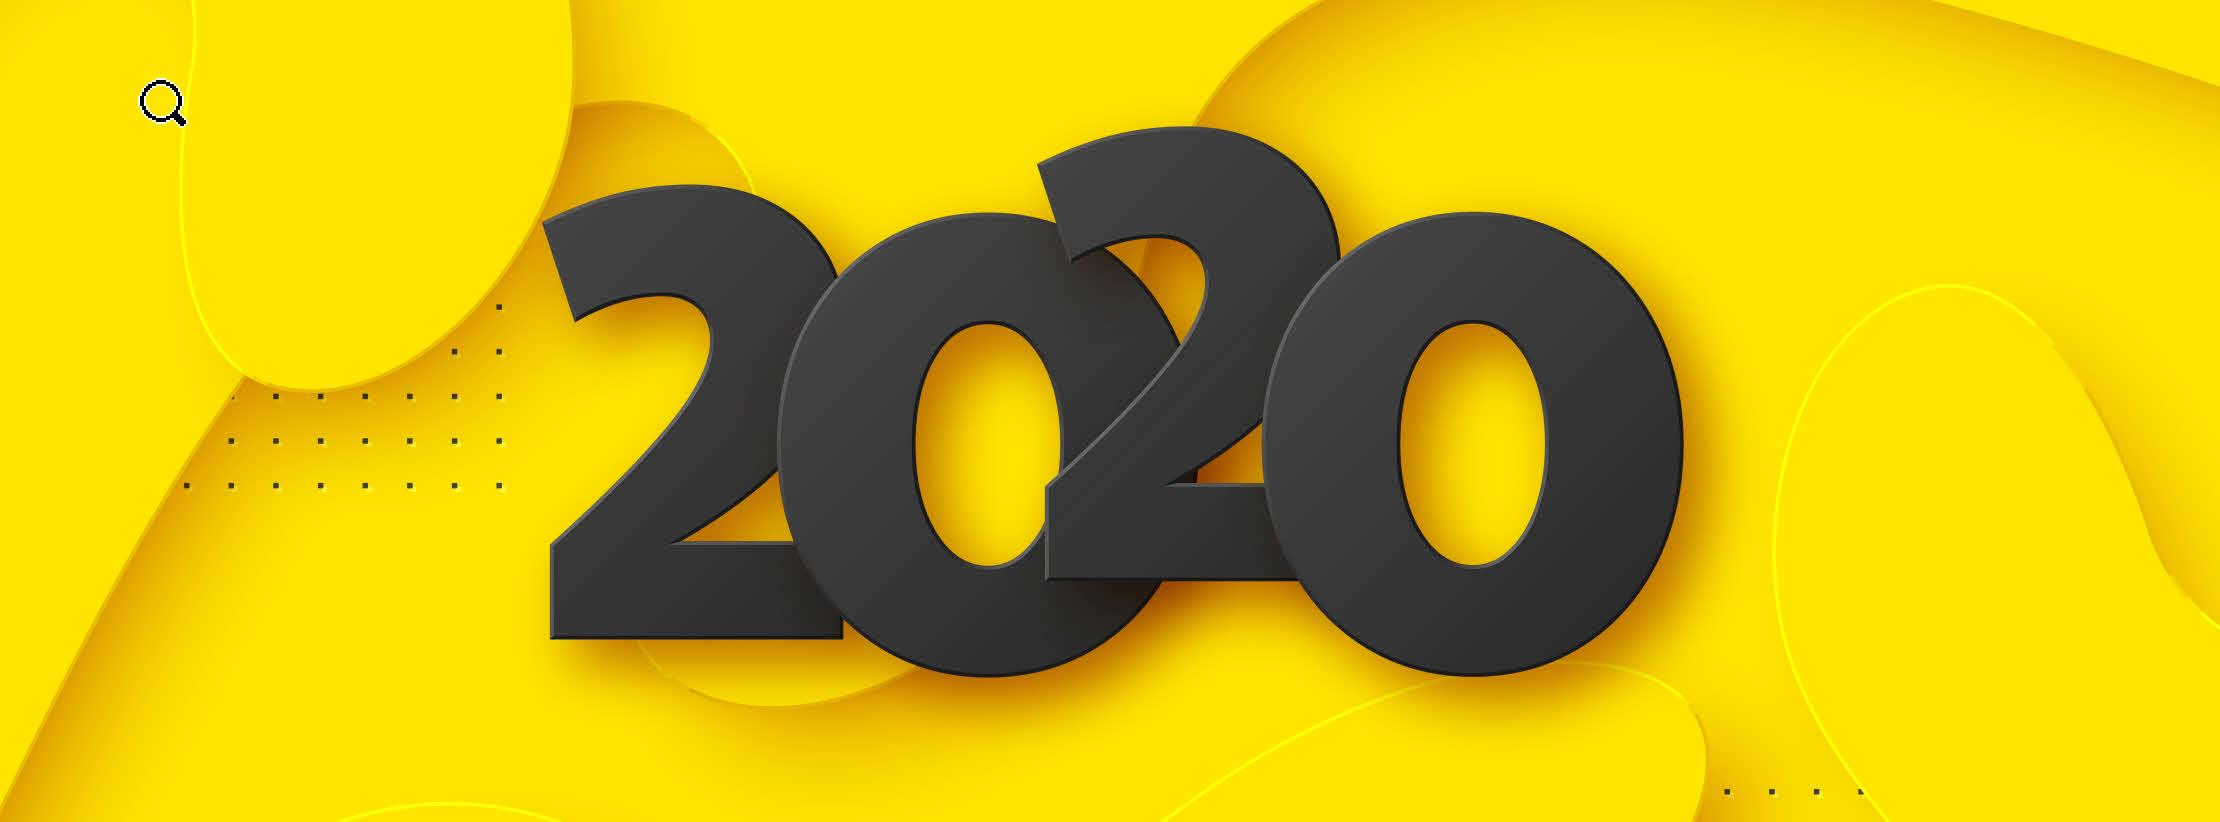 Top Trends 2020.Top 10 Digital Infrastructure Trends For 2020 Uptime